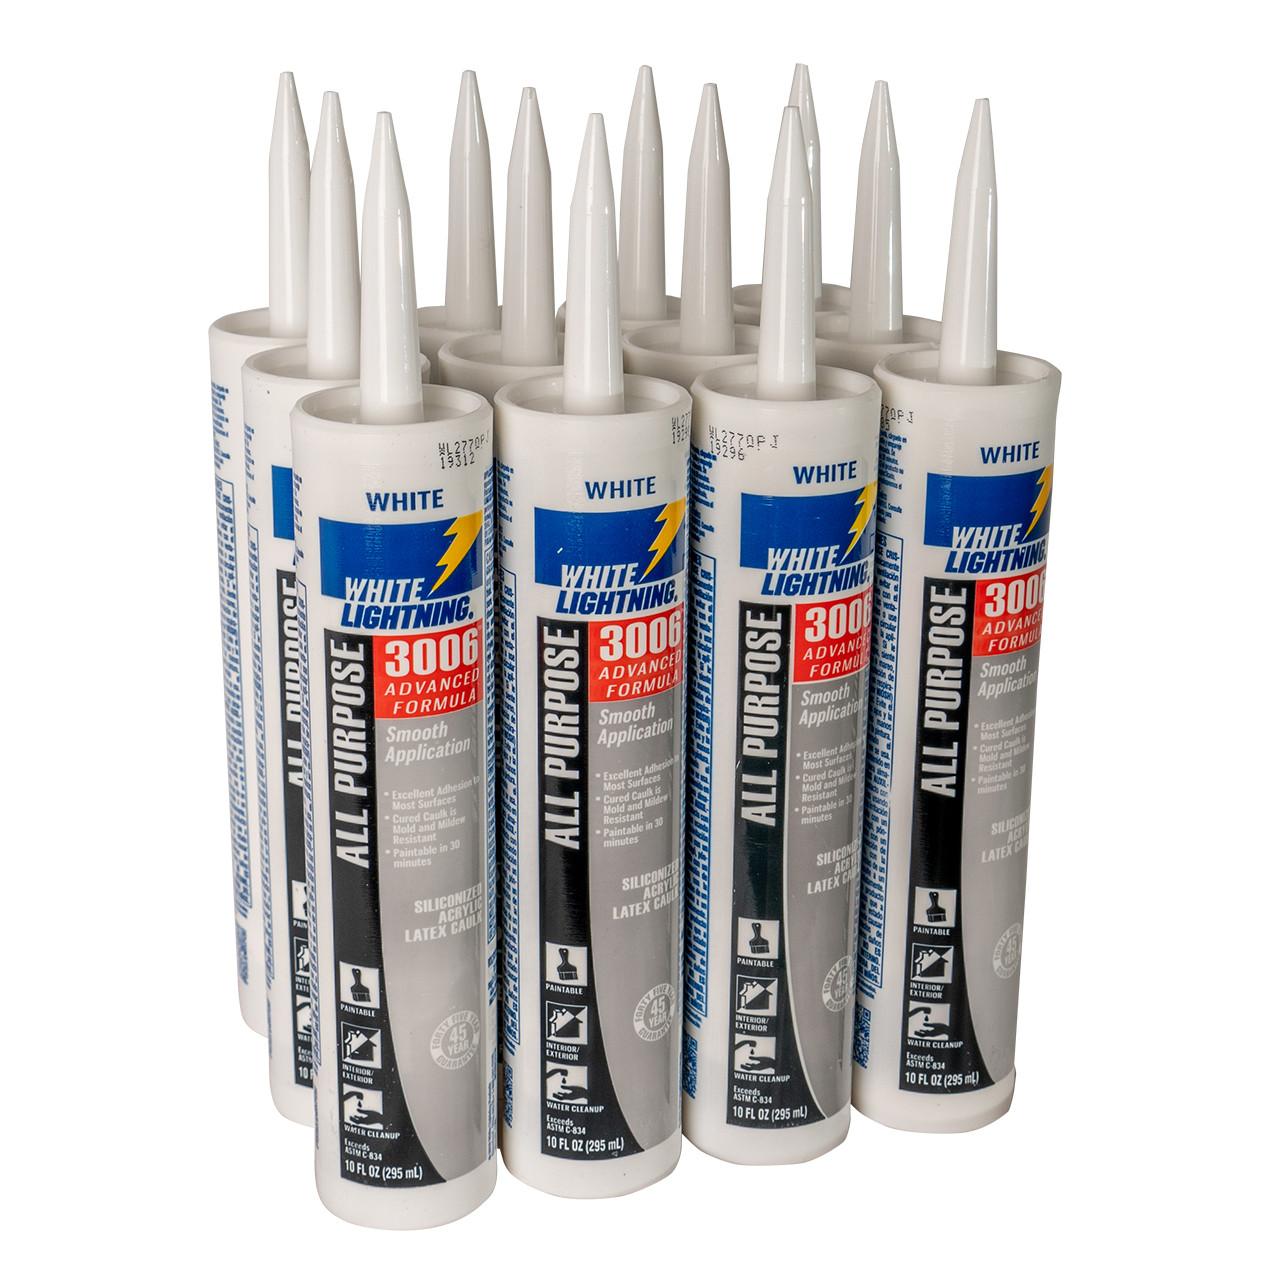 White Lightning 3006 Adhesive